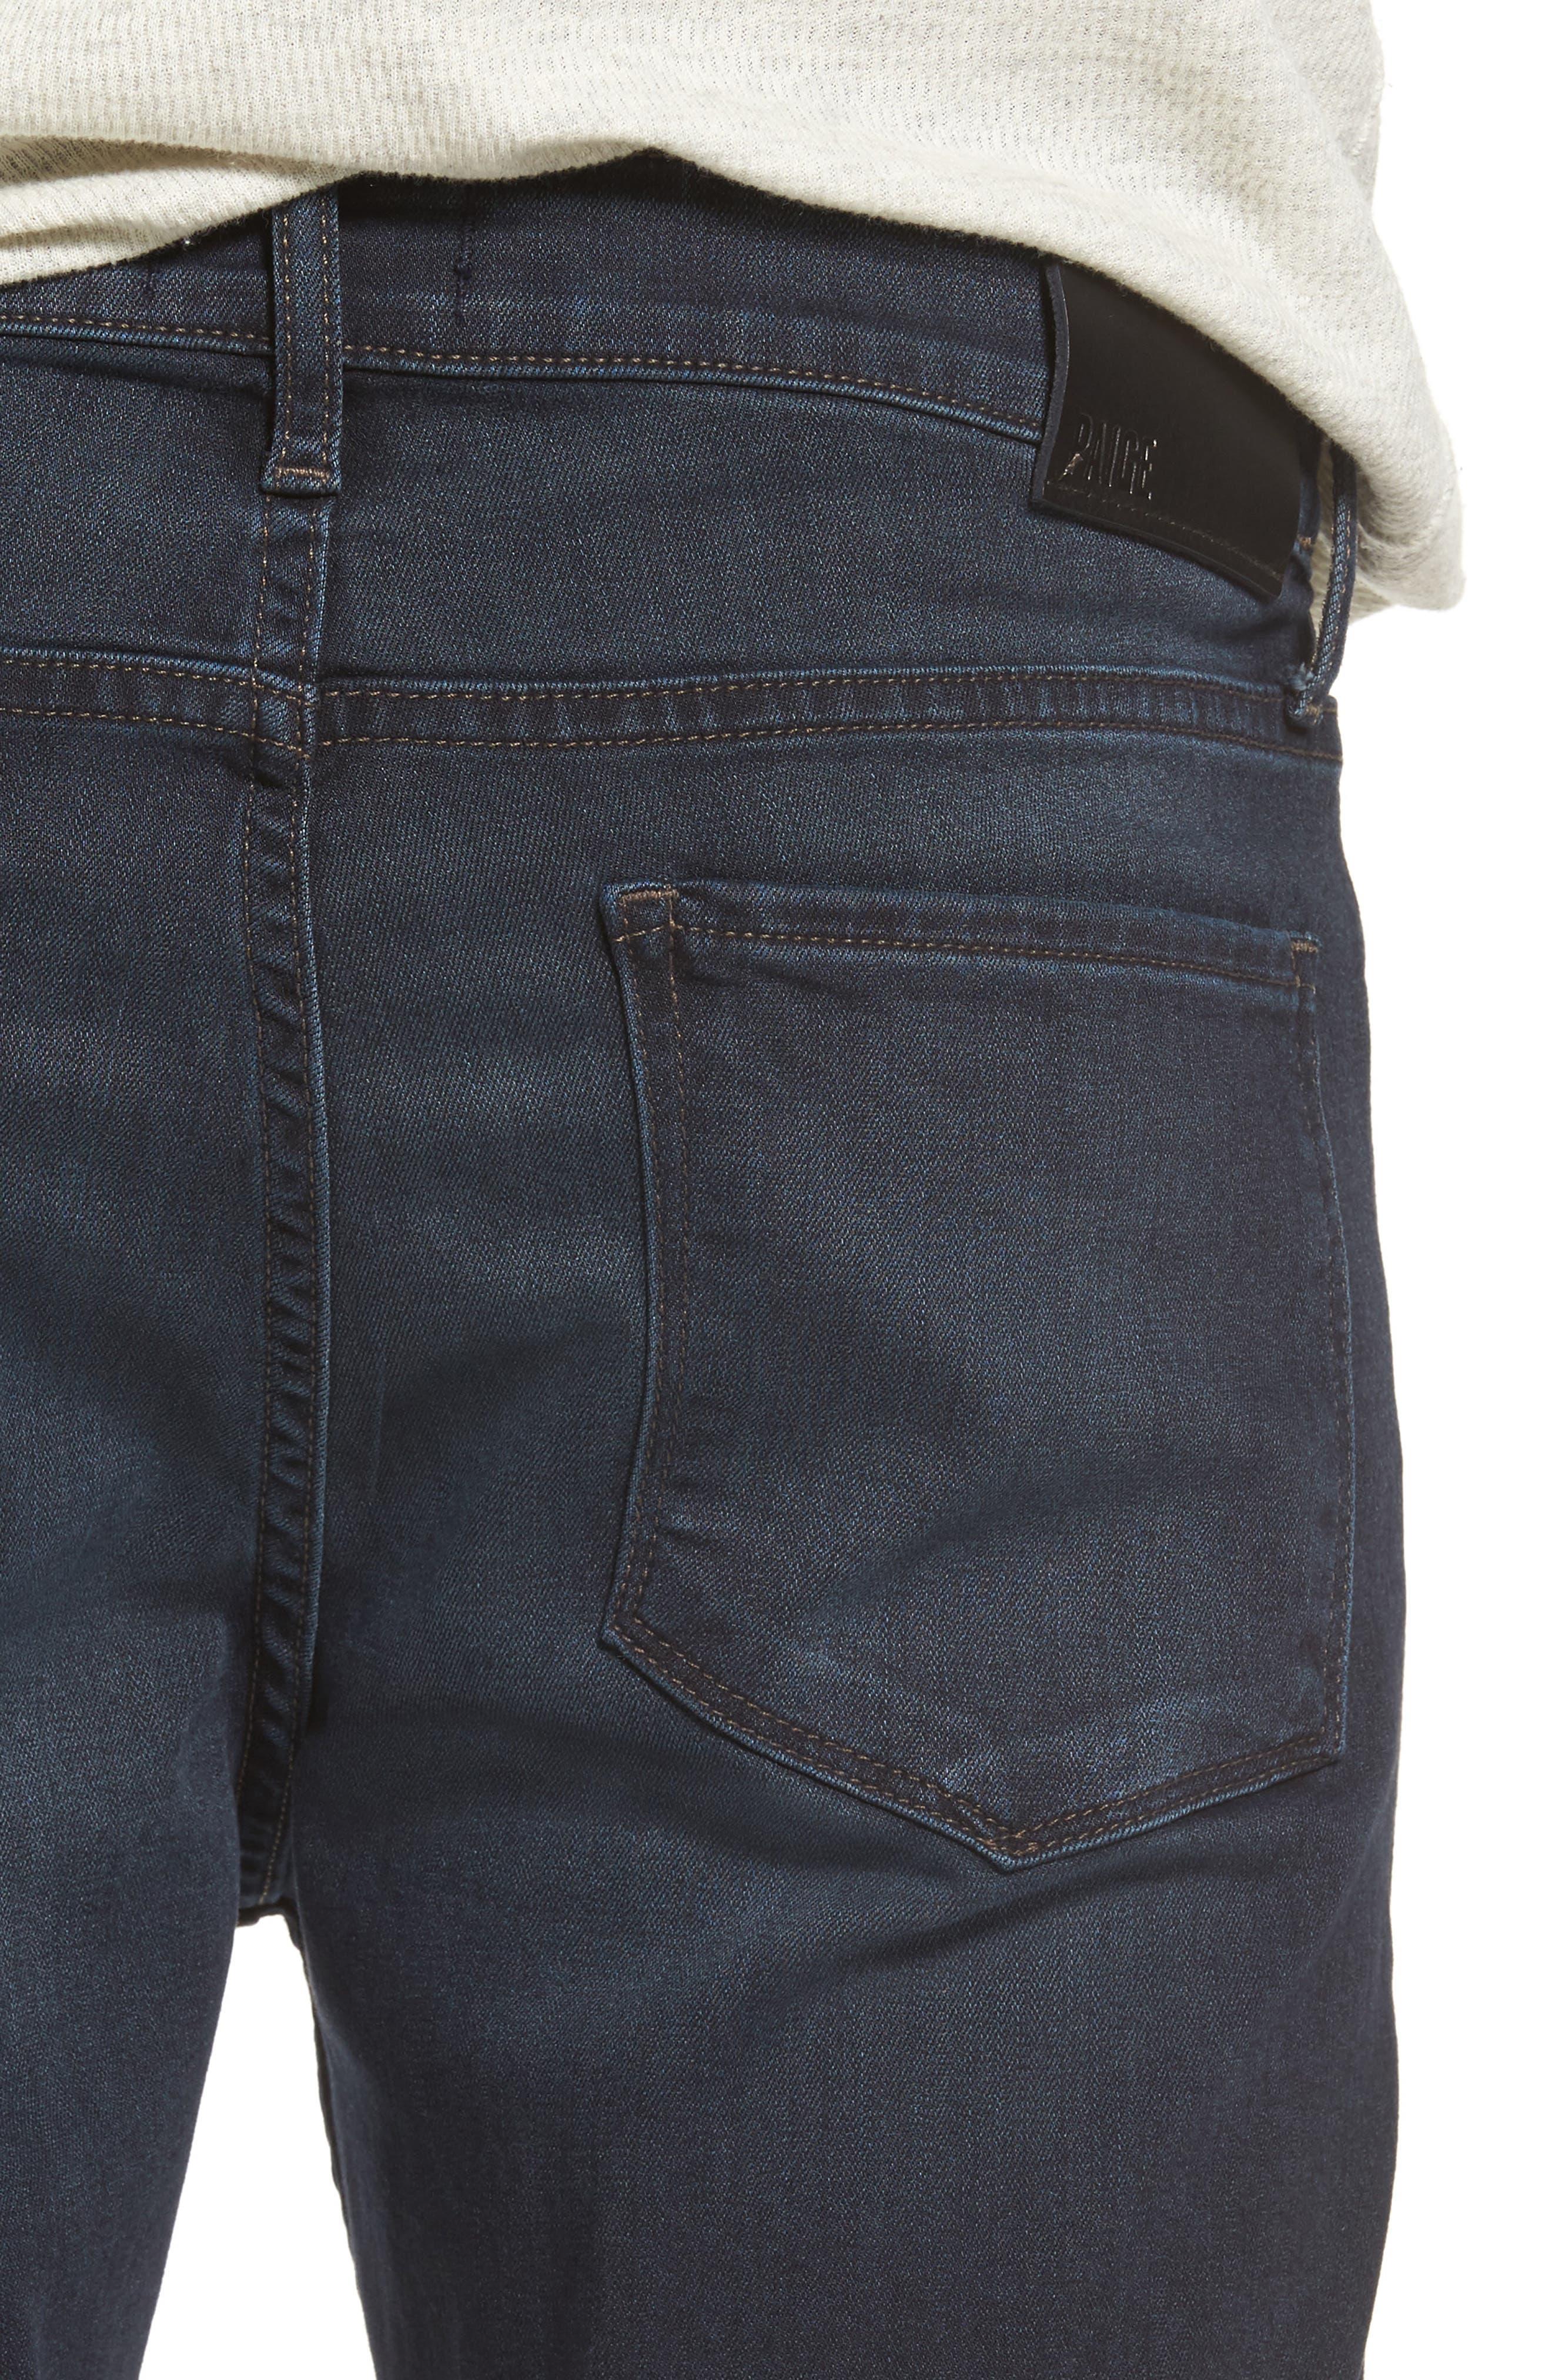 Croft Skinny Fit Jeans,                             Alternate thumbnail 4, color,                             400